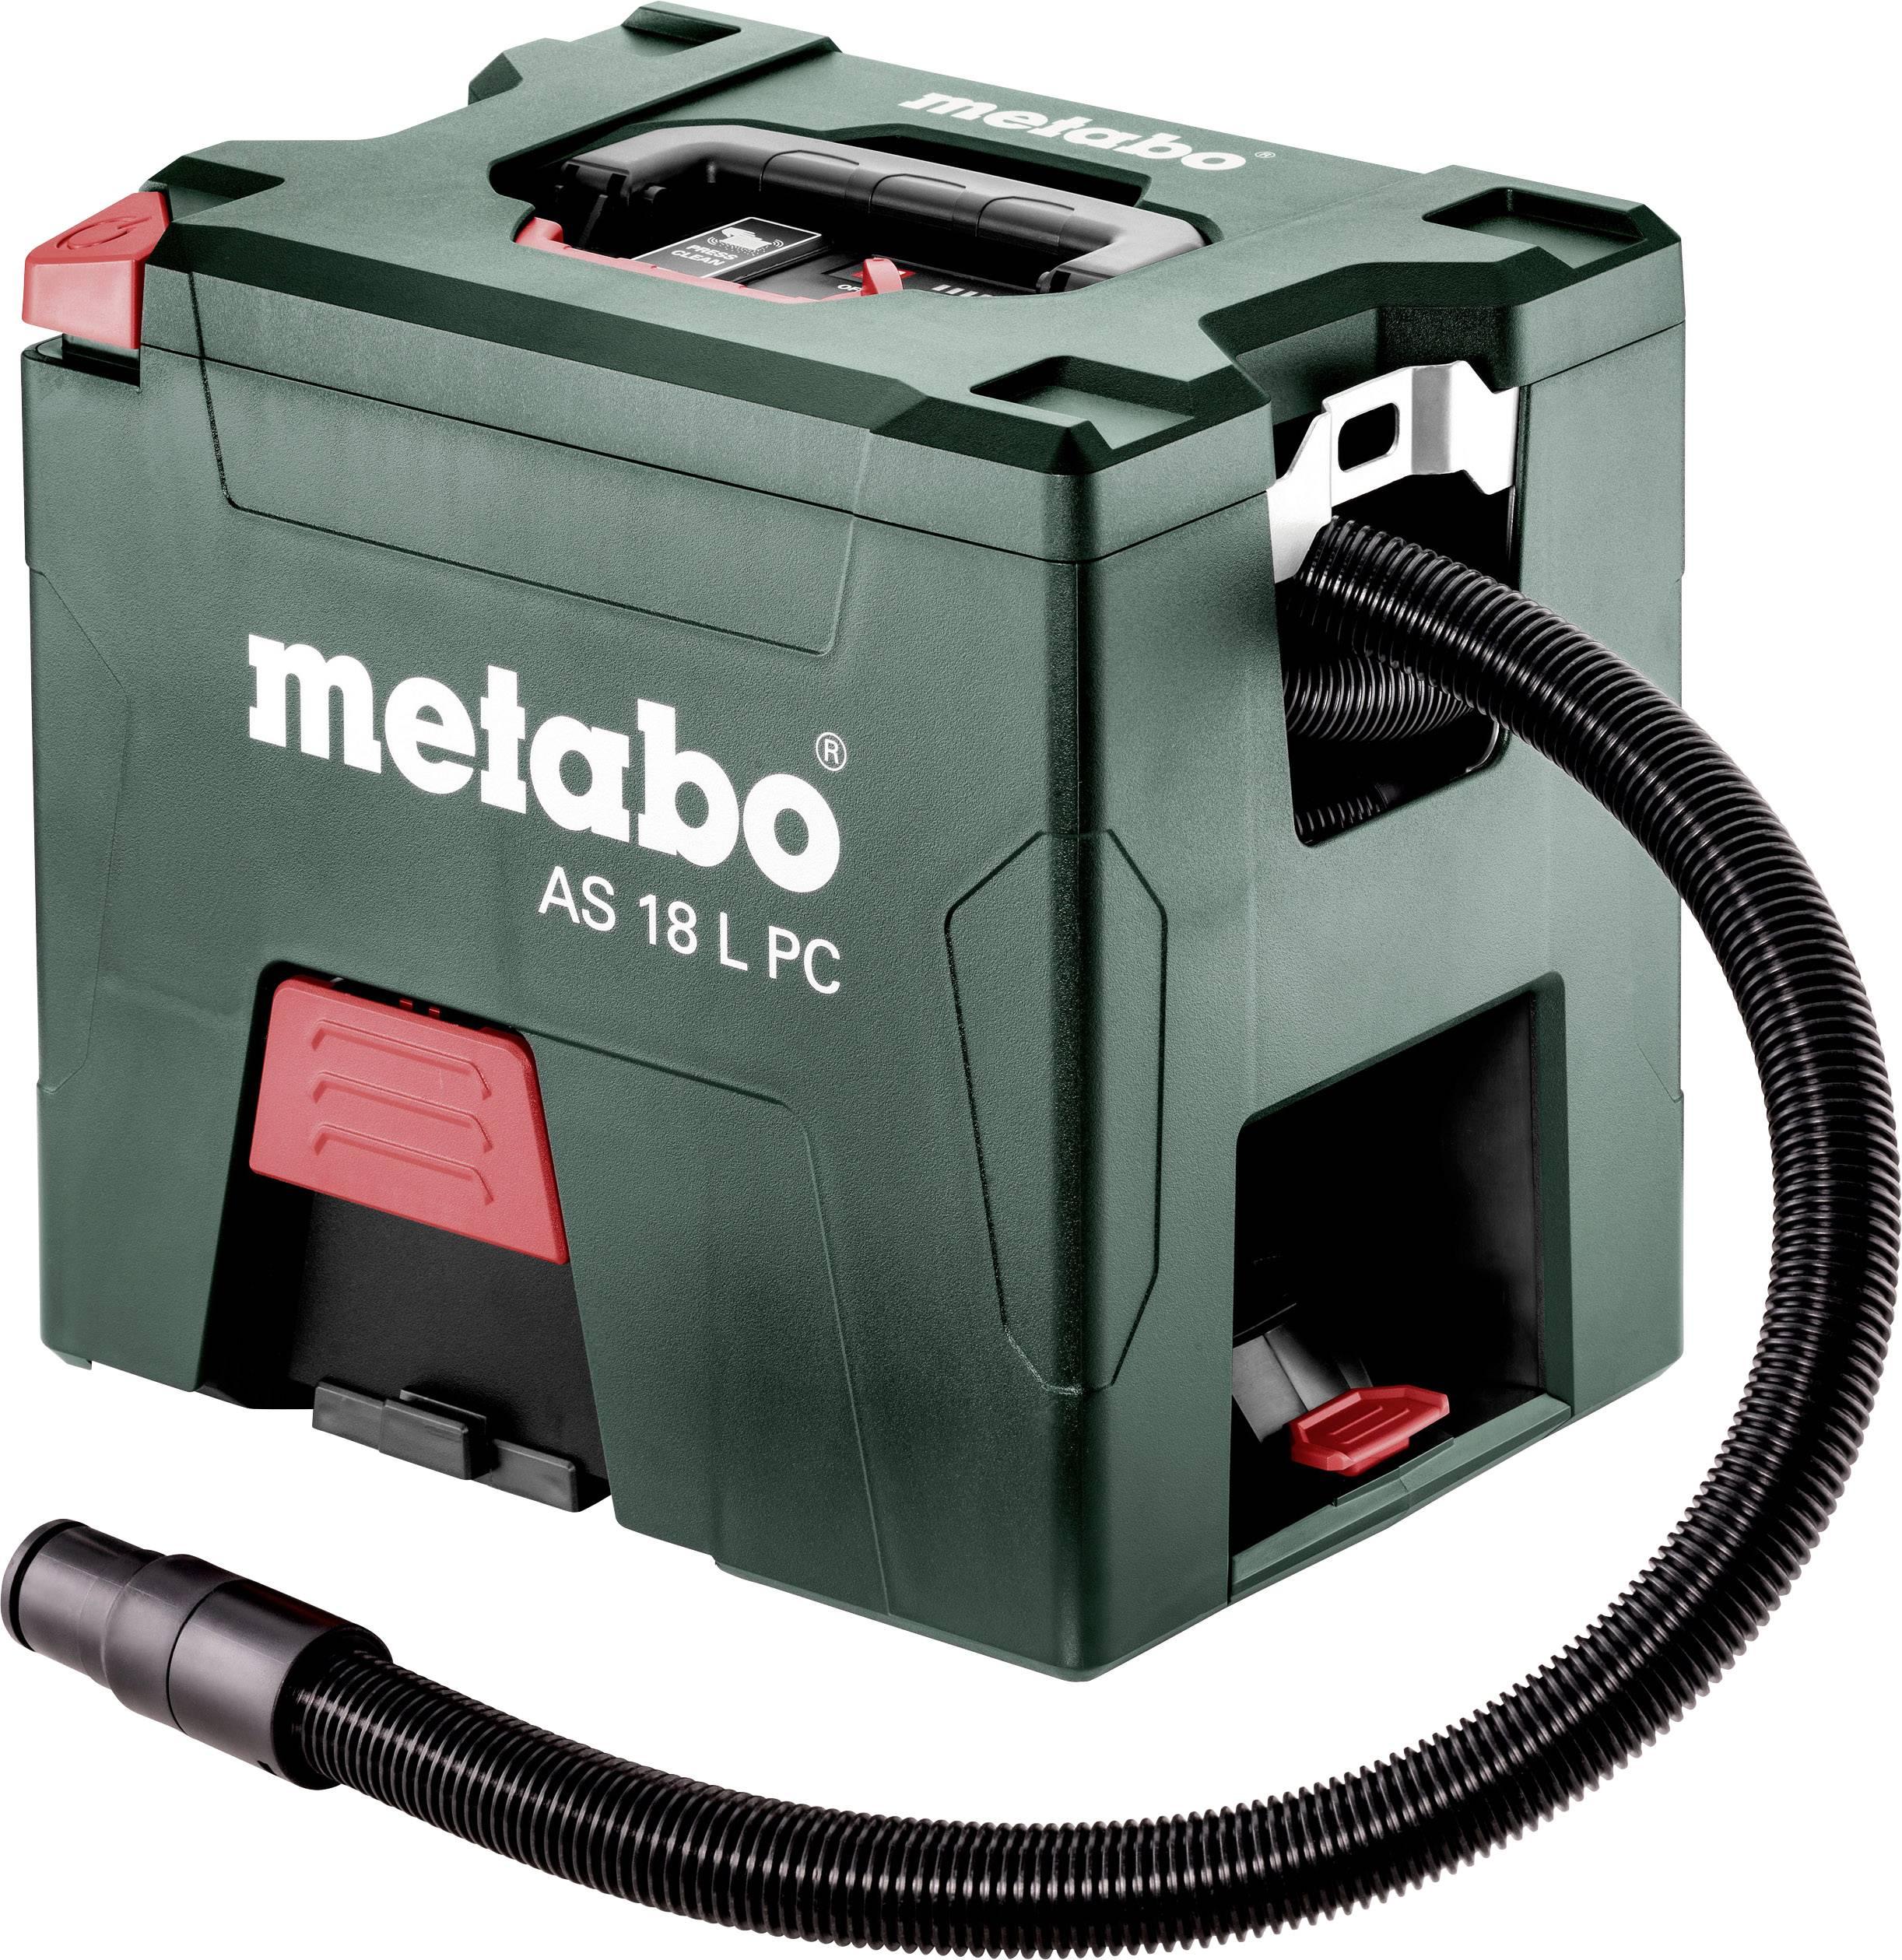 Suchý vysavač Metabo AS 18 L PC 602021000, 7.50 l